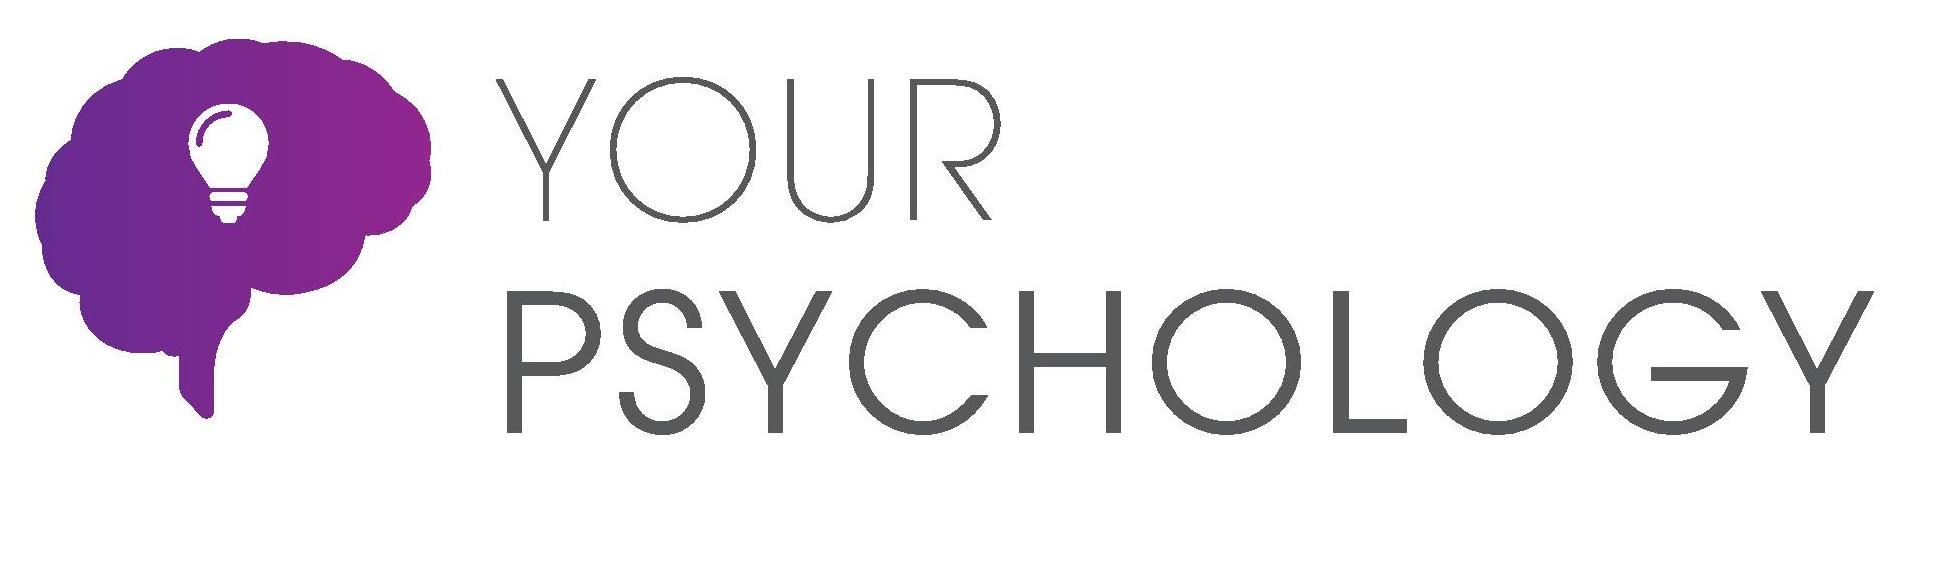 Your Psychology Service